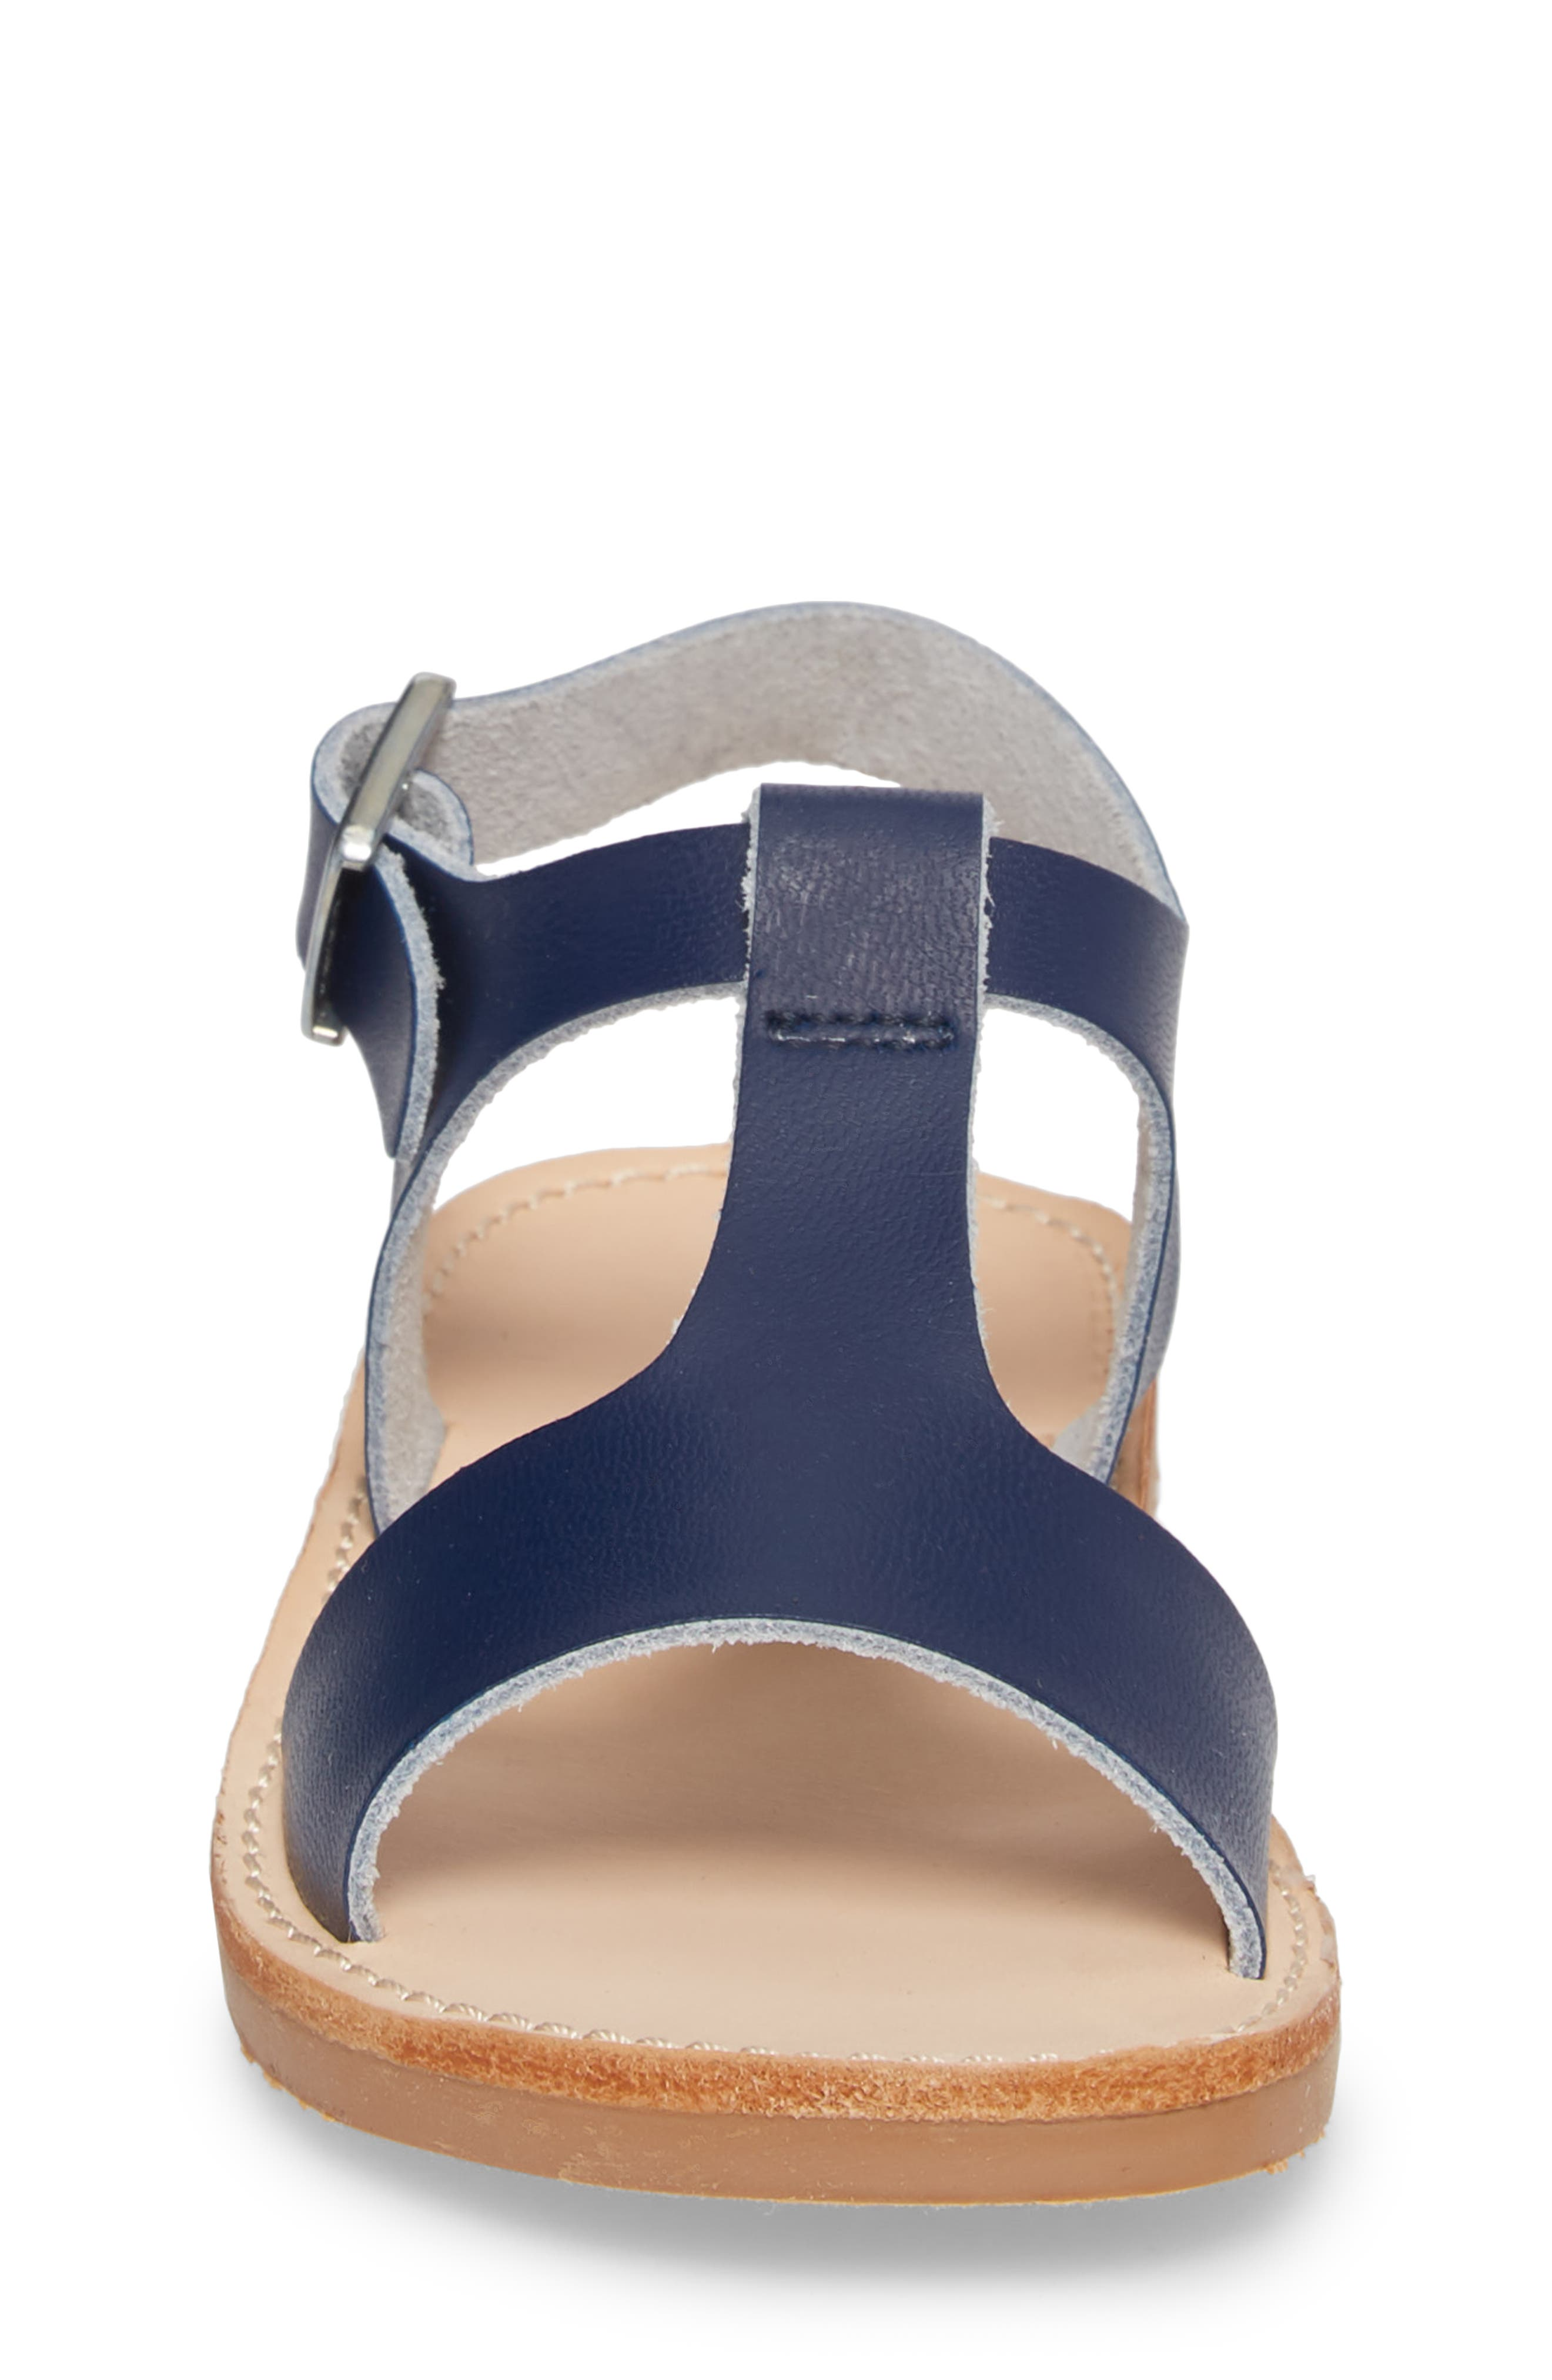 Malibu Water Resistant Sandal,                             Alternate thumbnail 4, color,                             Navy